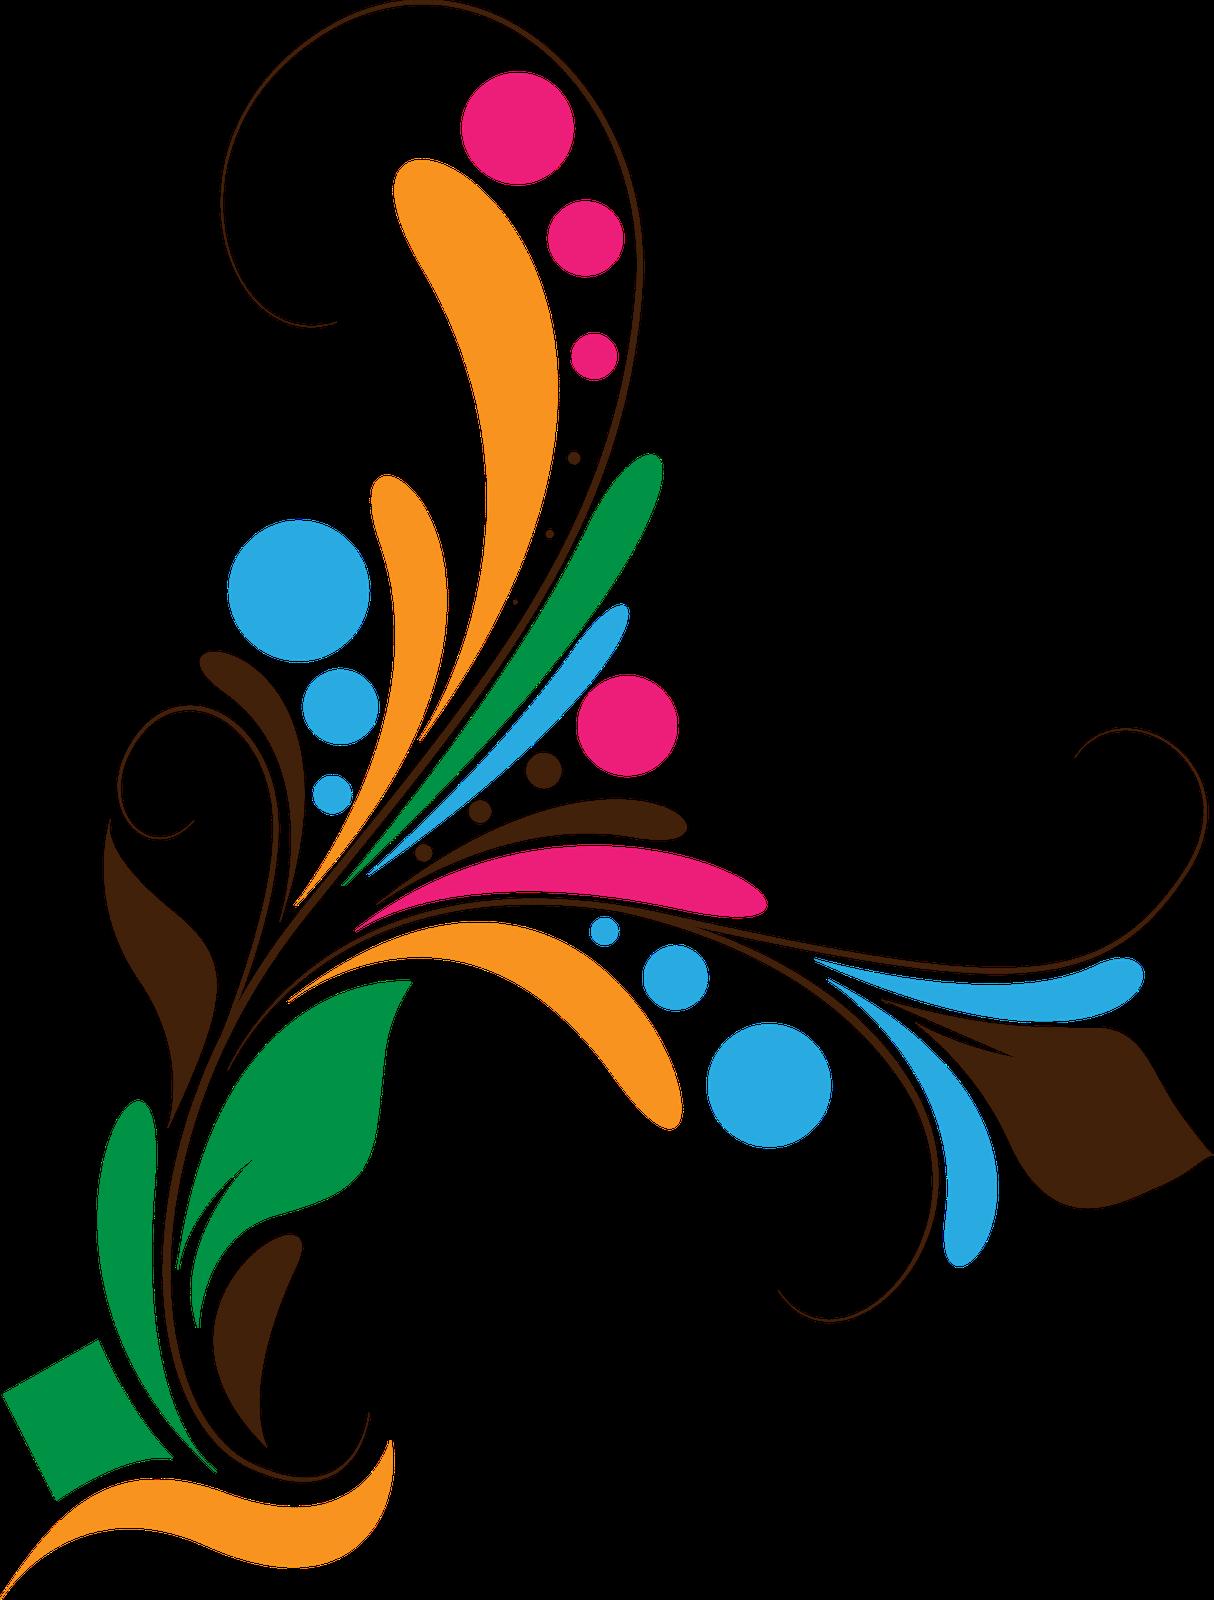 Line Art Vector Png : Download flowers vectors transparent hq png image freepngimg